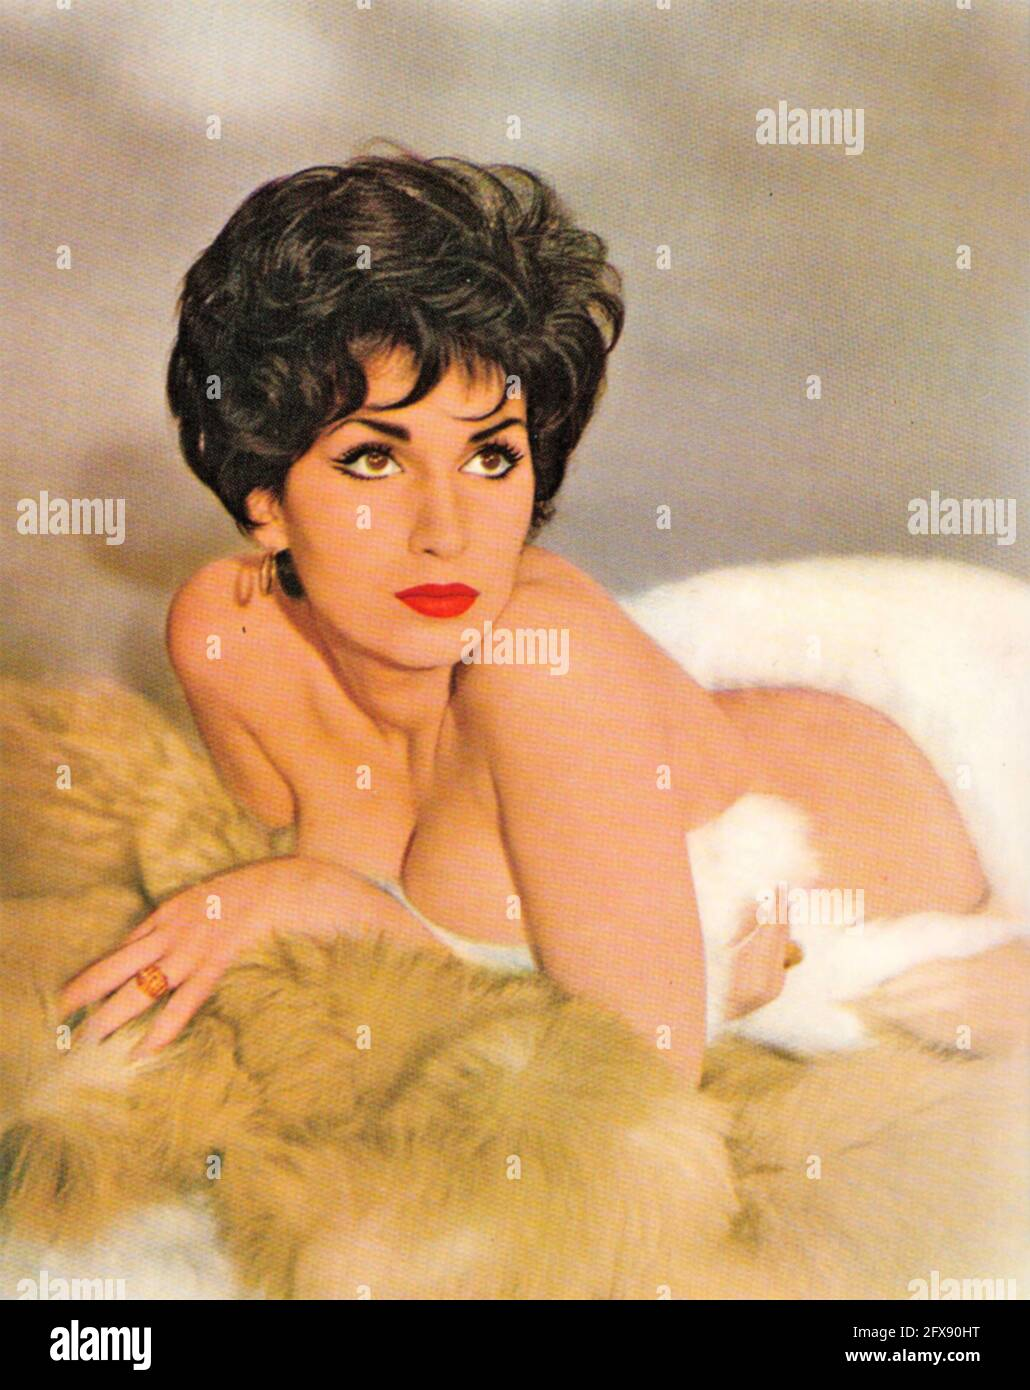 YVONNE ROMAIN English film actress about 1960 Stock Photo